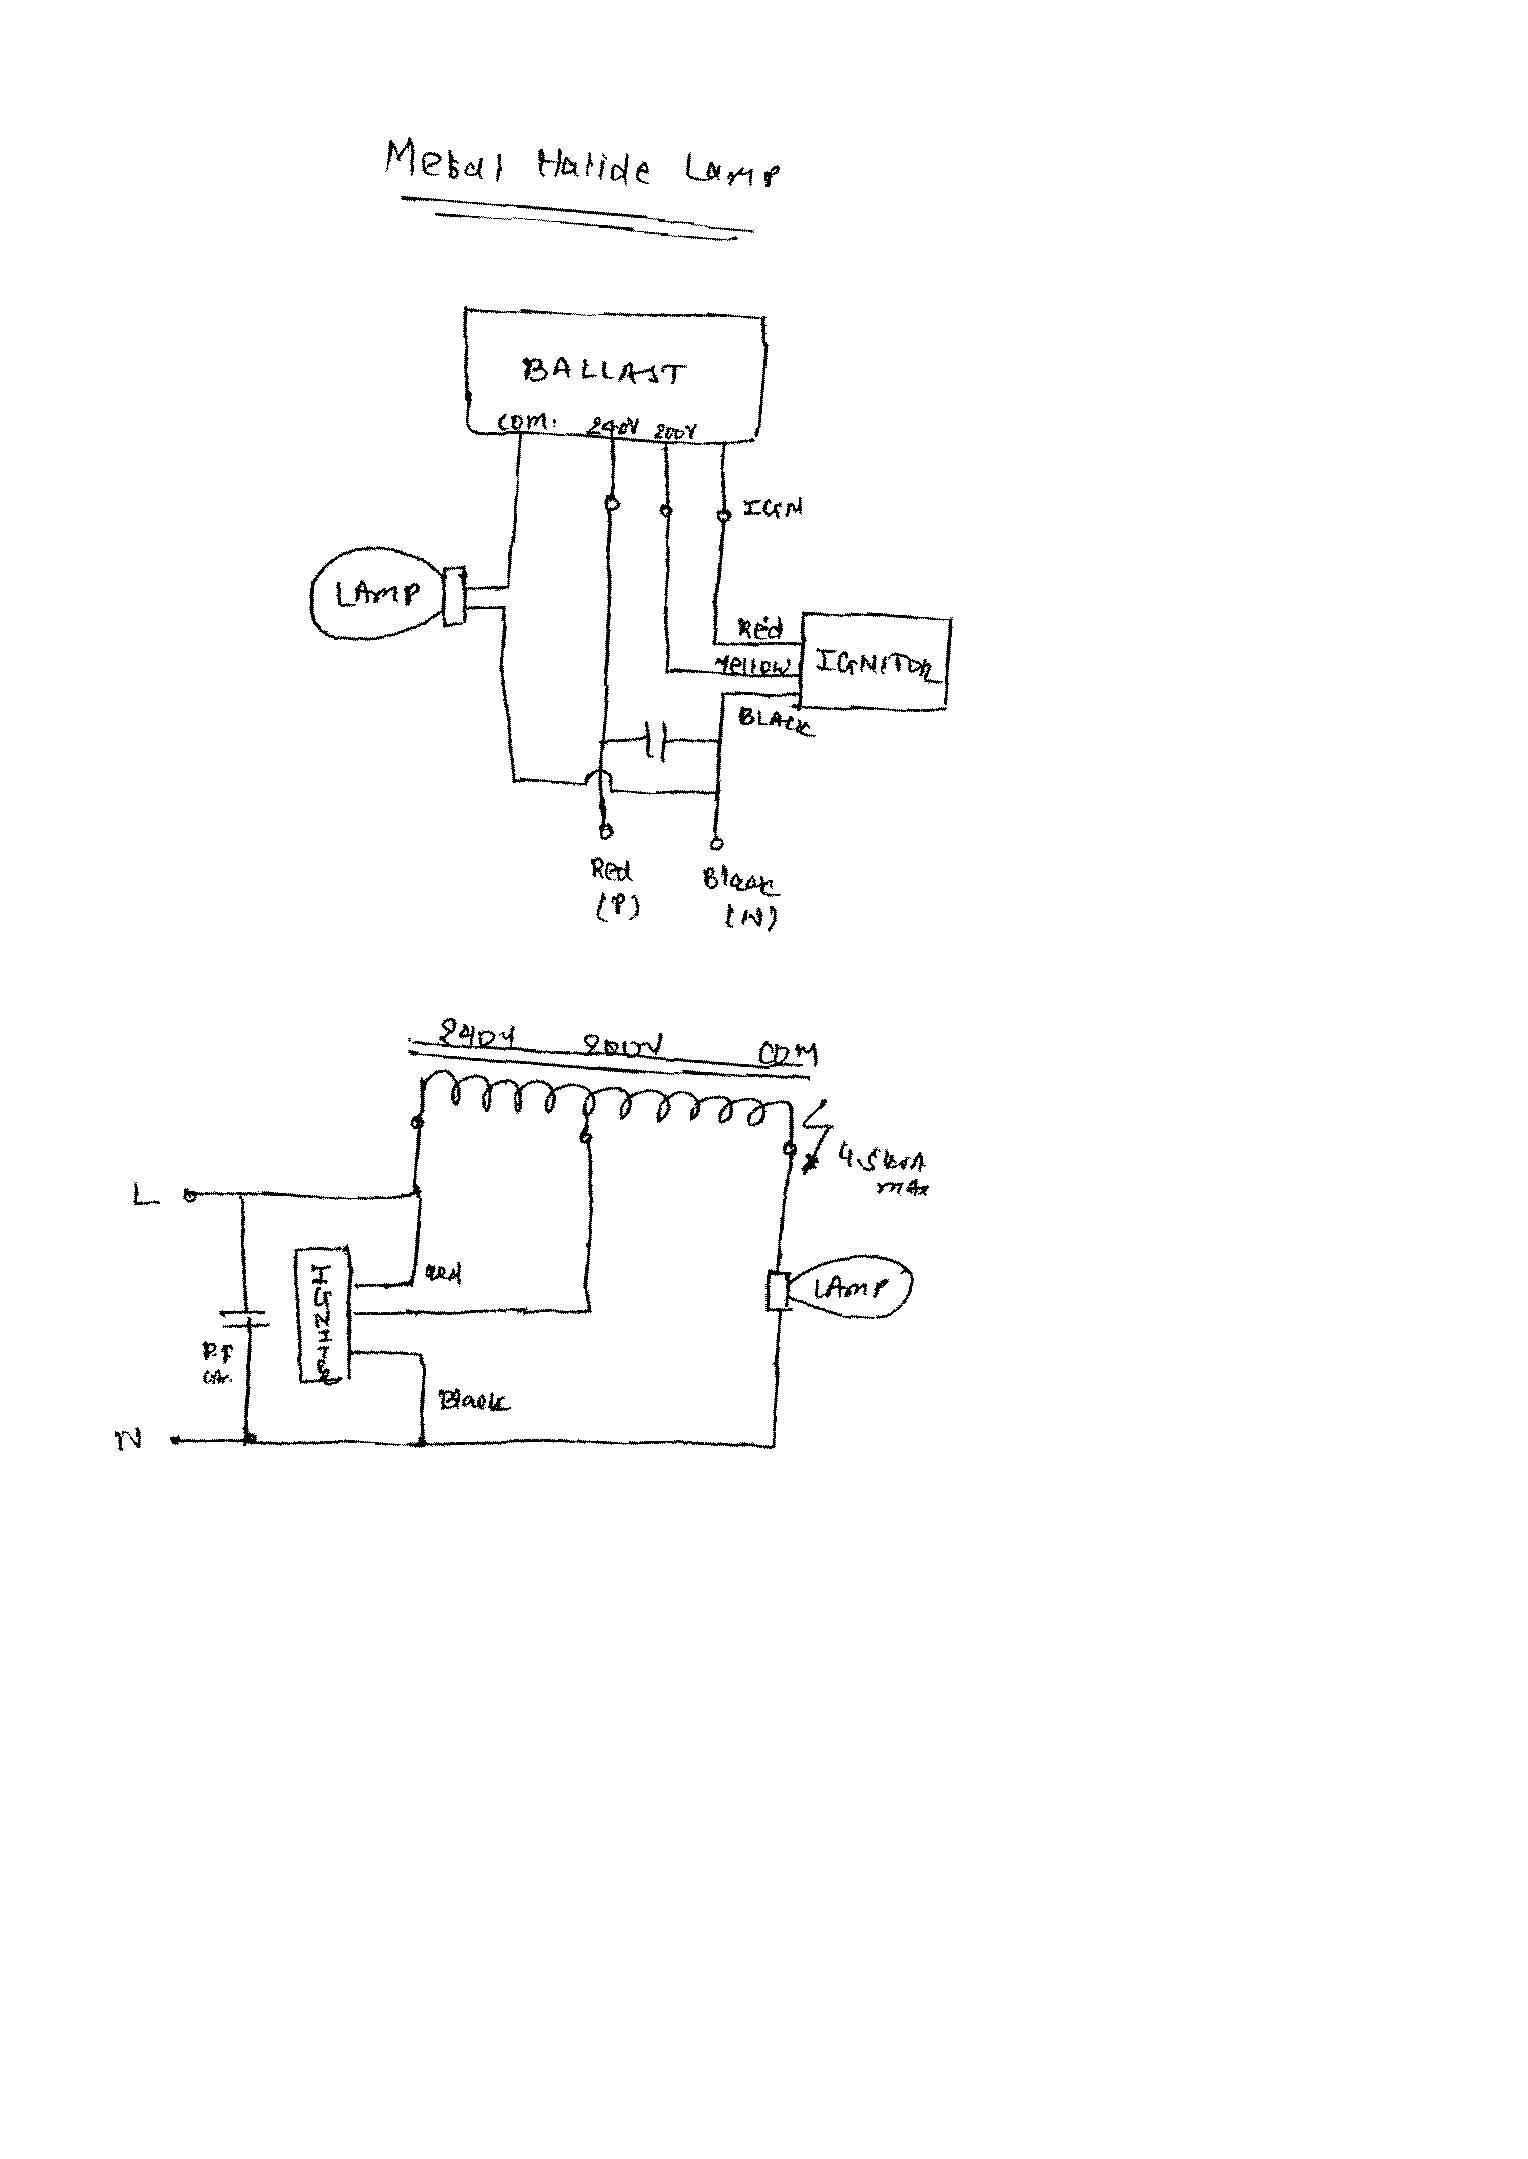 elegant watt high pressure sodium ballast wiring diagram wiring diagrams rh  arquetipos co high pressure sodium light color high pressure sodium light  color